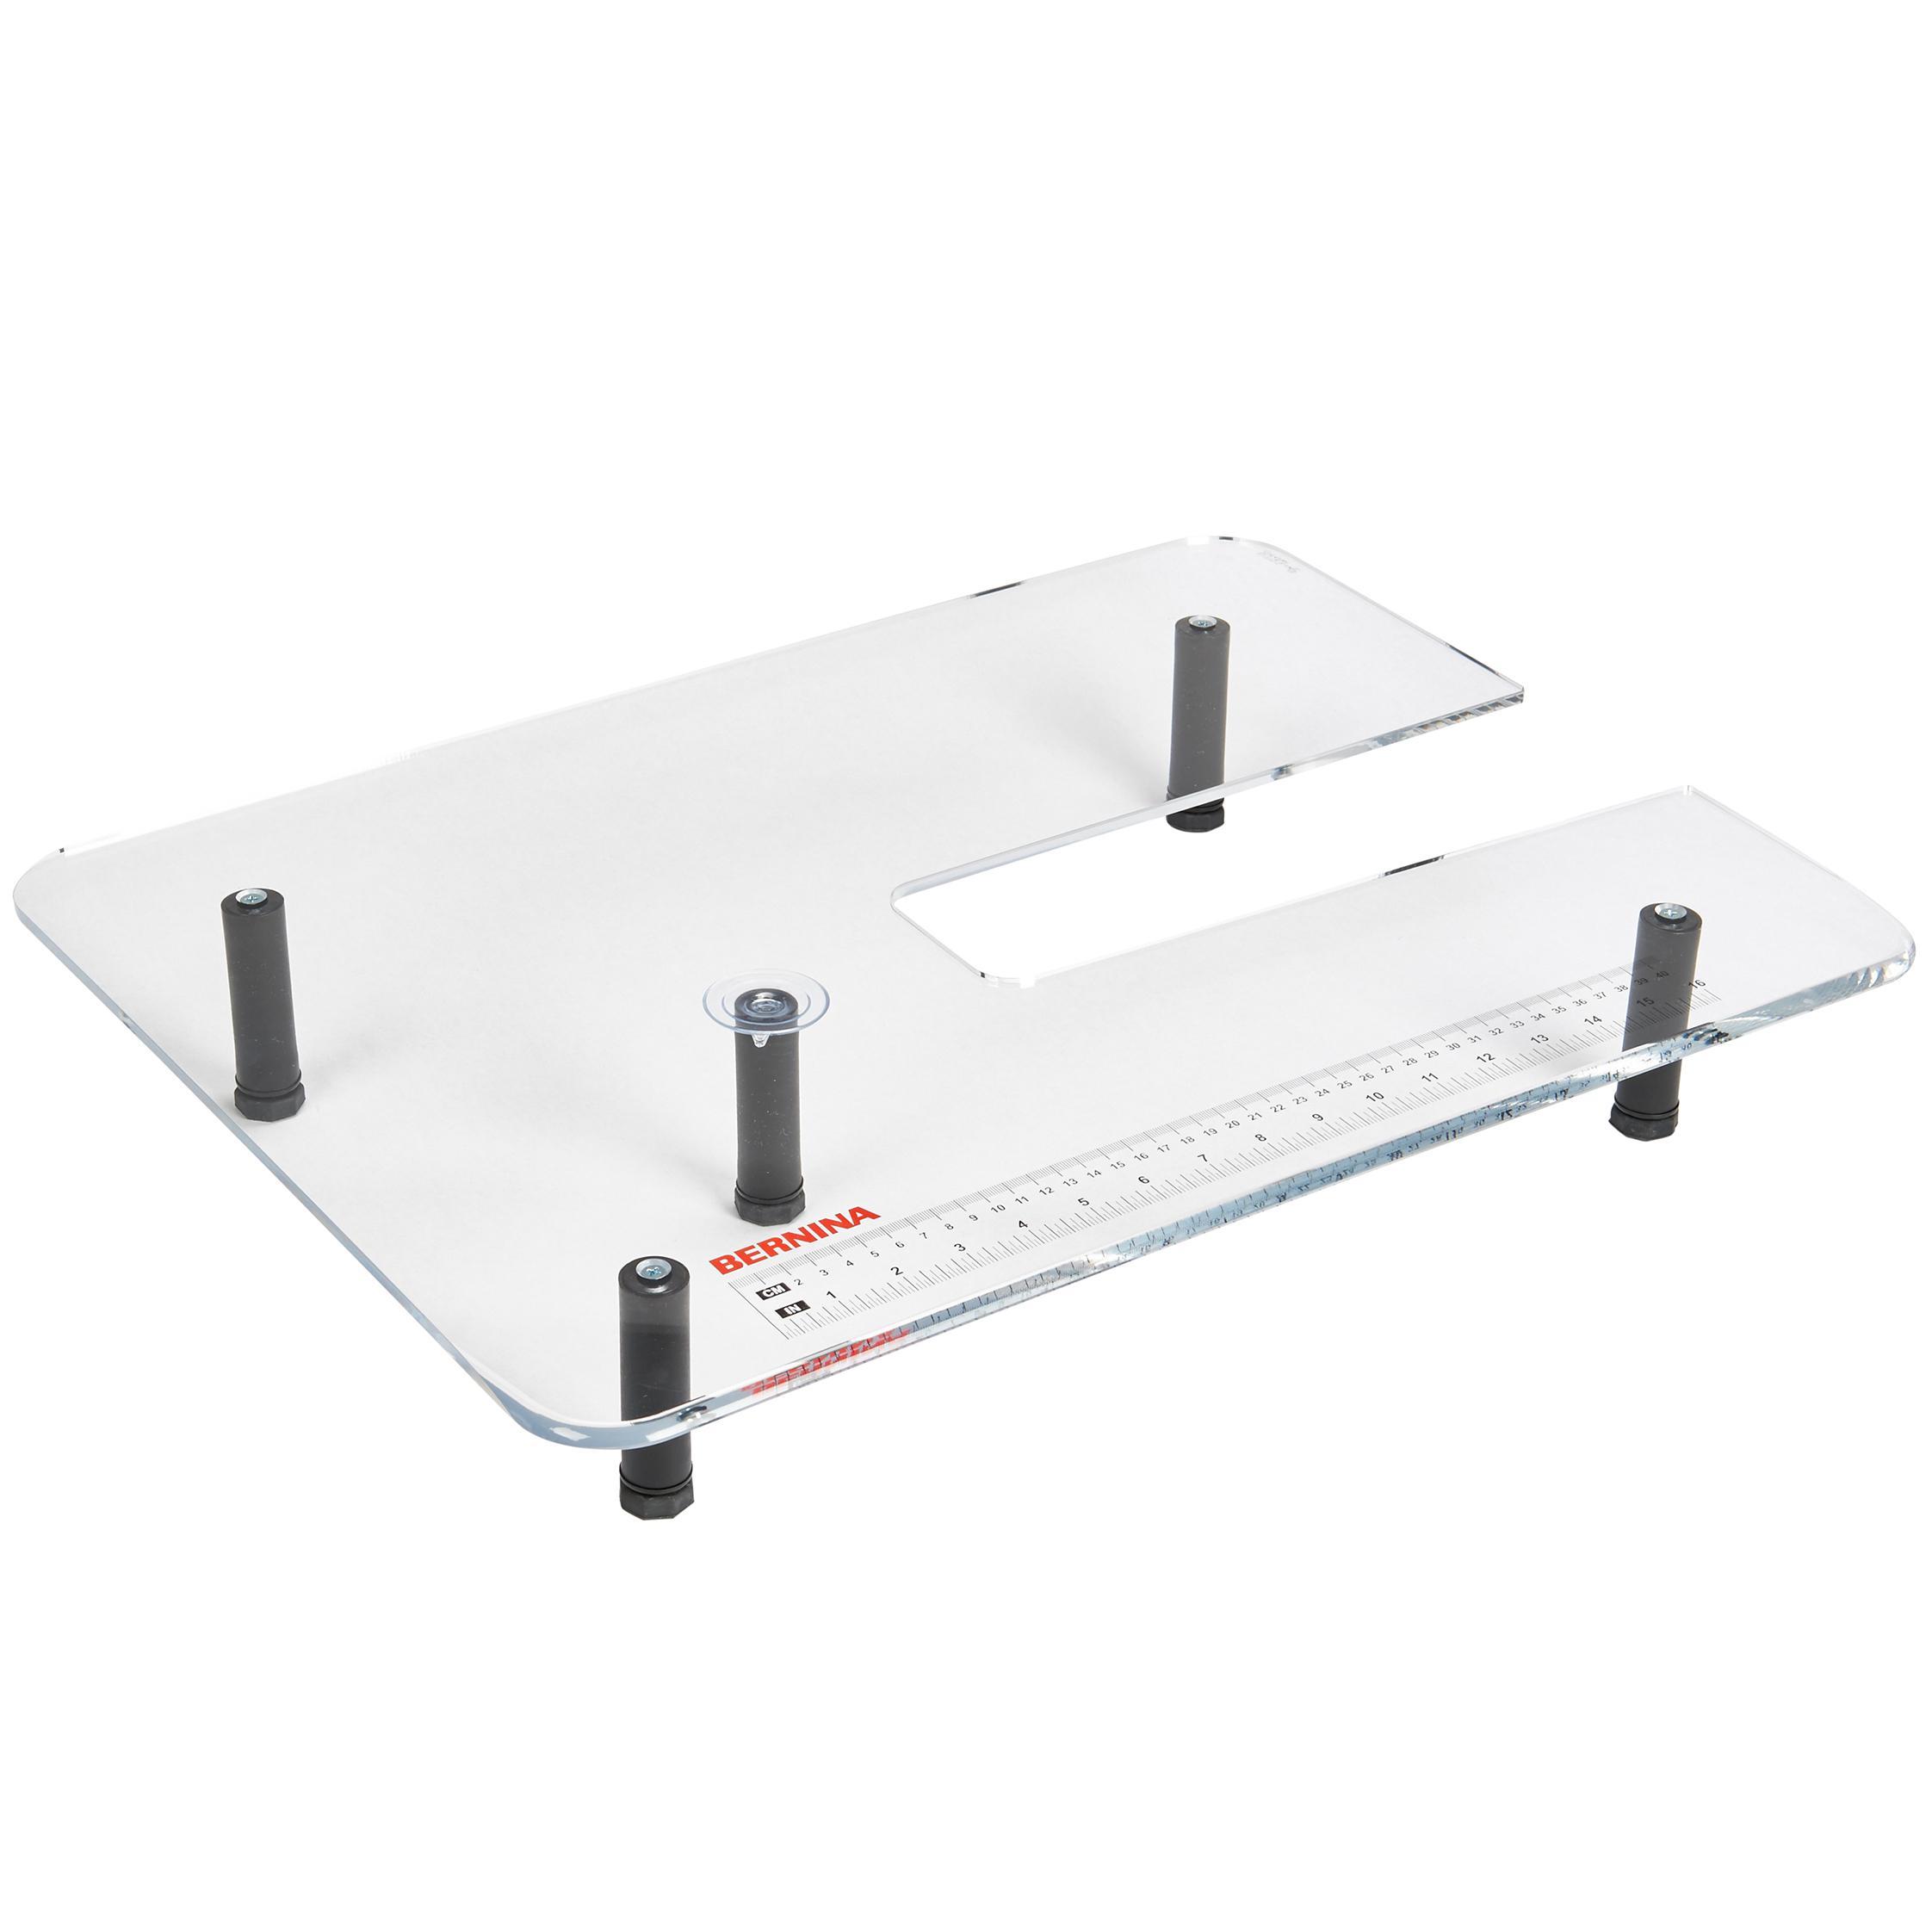 Bernina Plexiglass Extension Table for Quilting